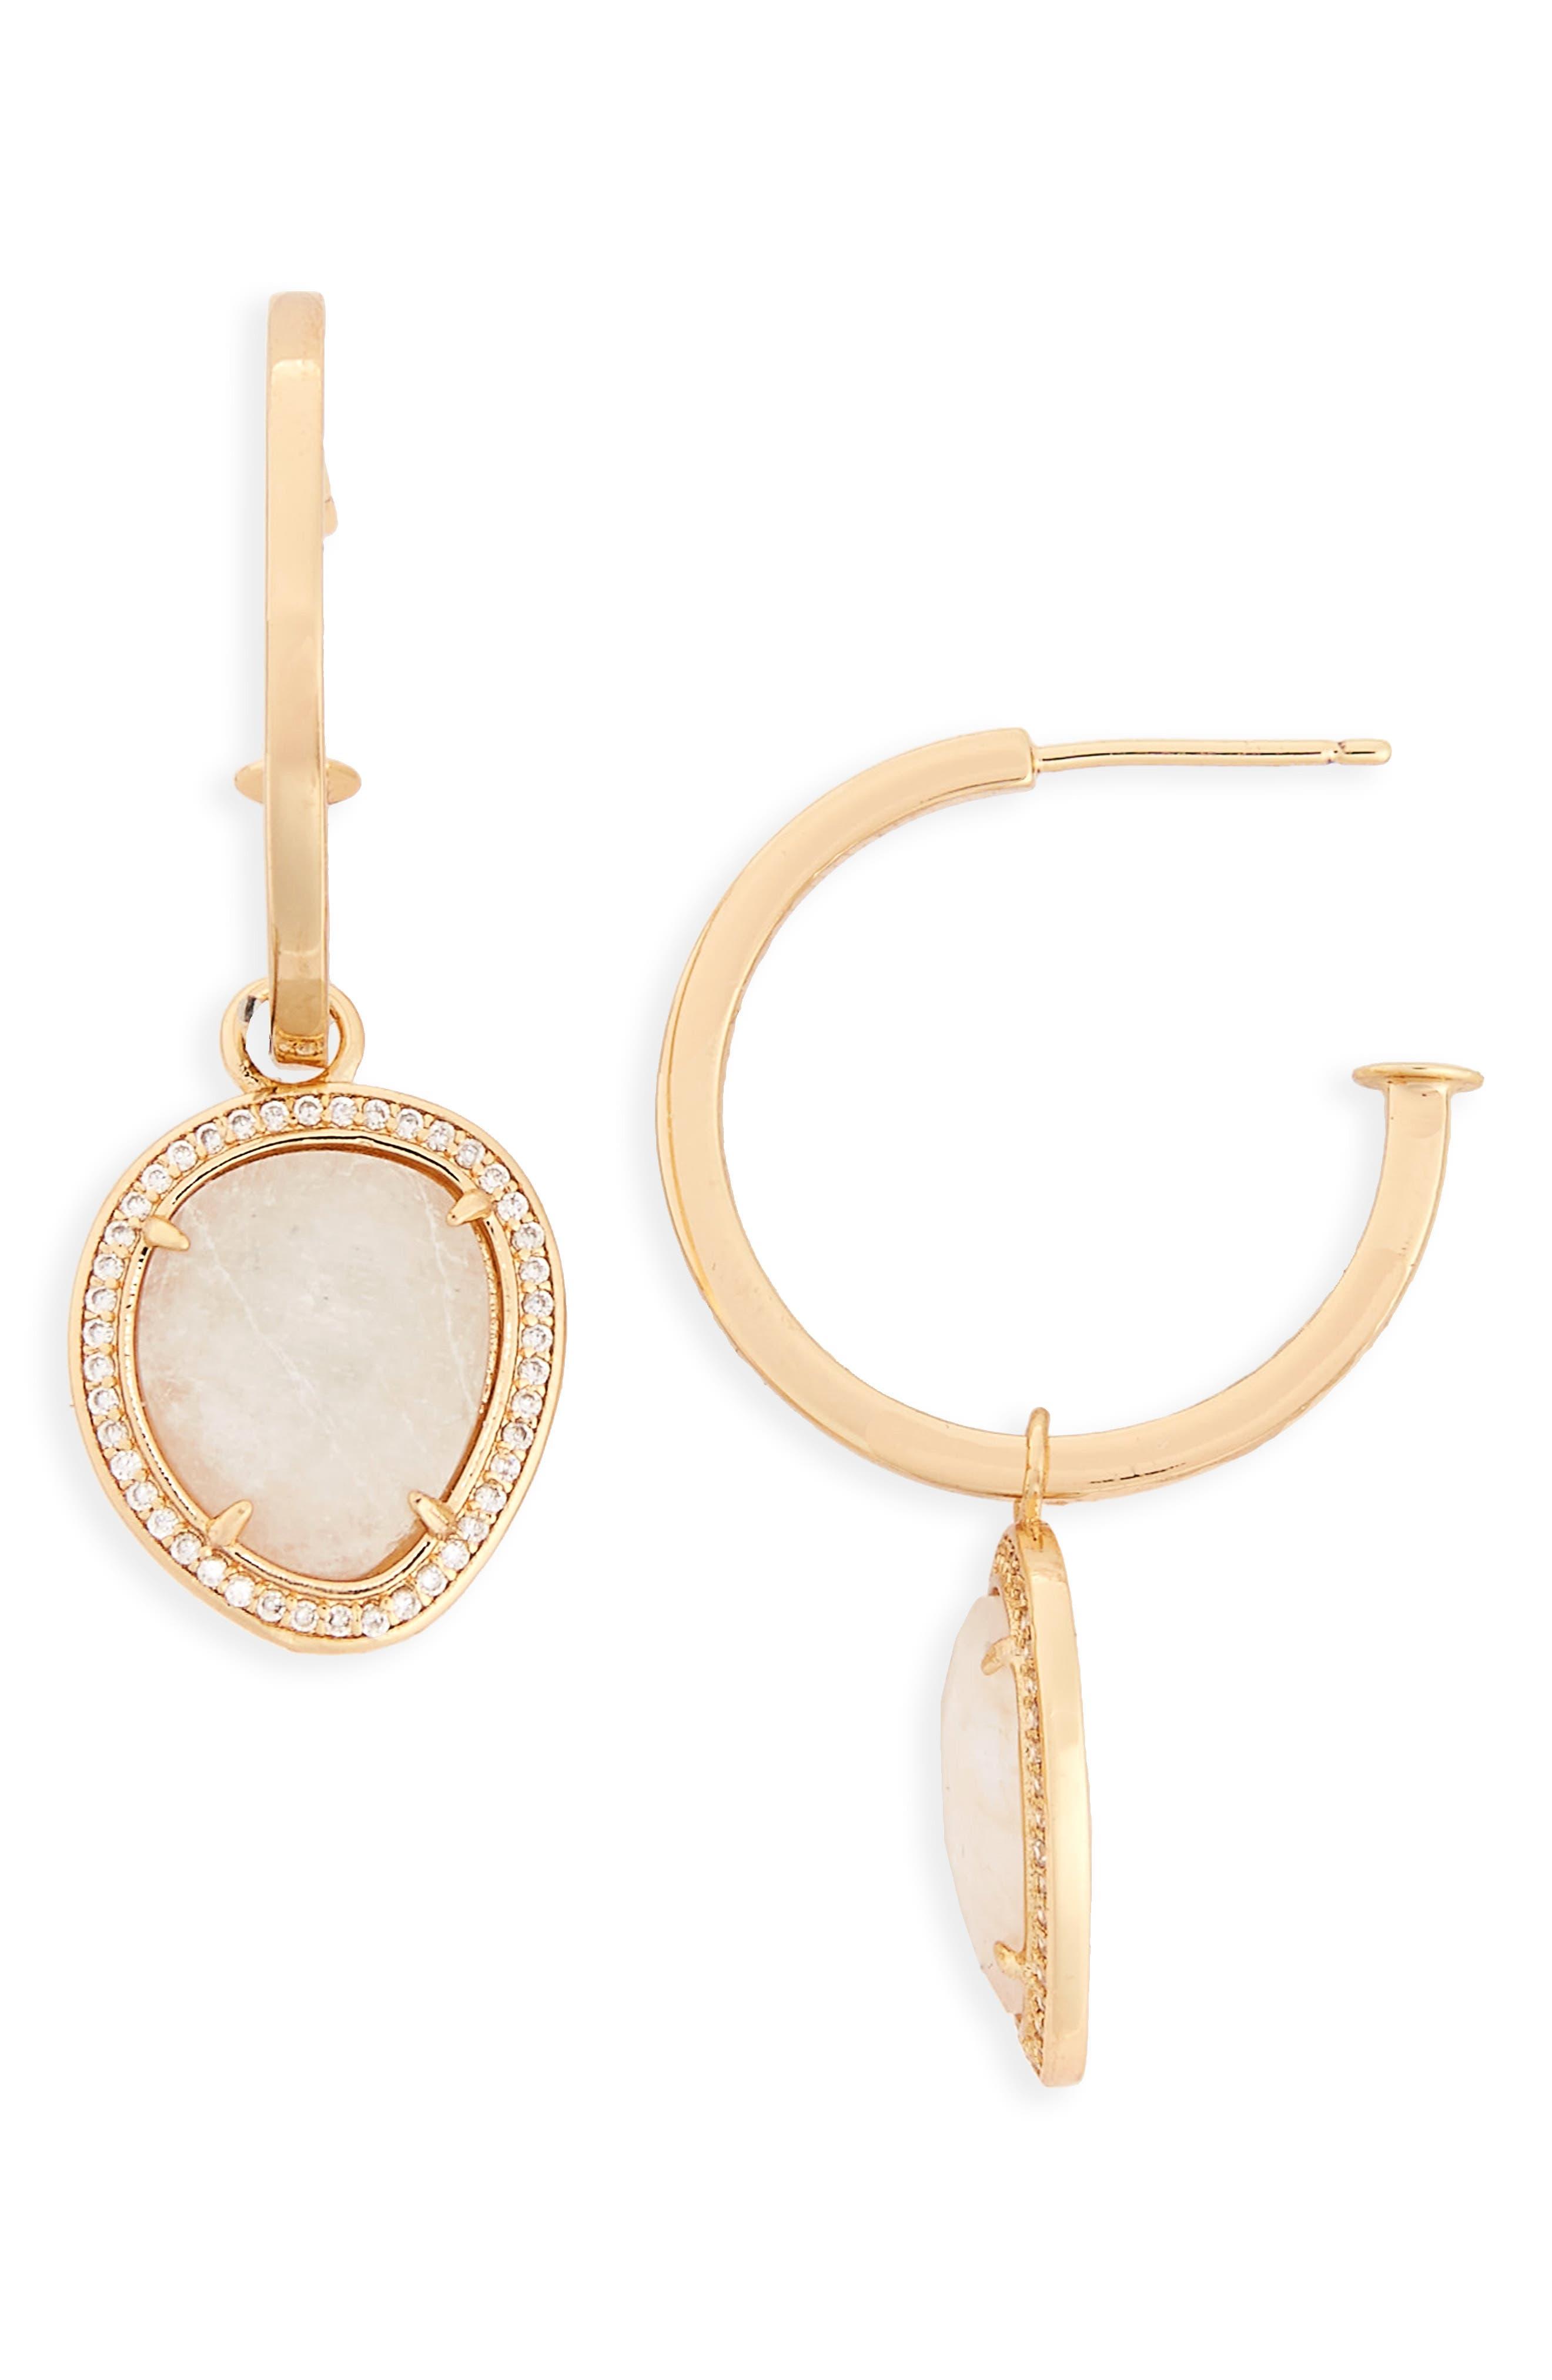 MELANIE AULD Drop Earrings